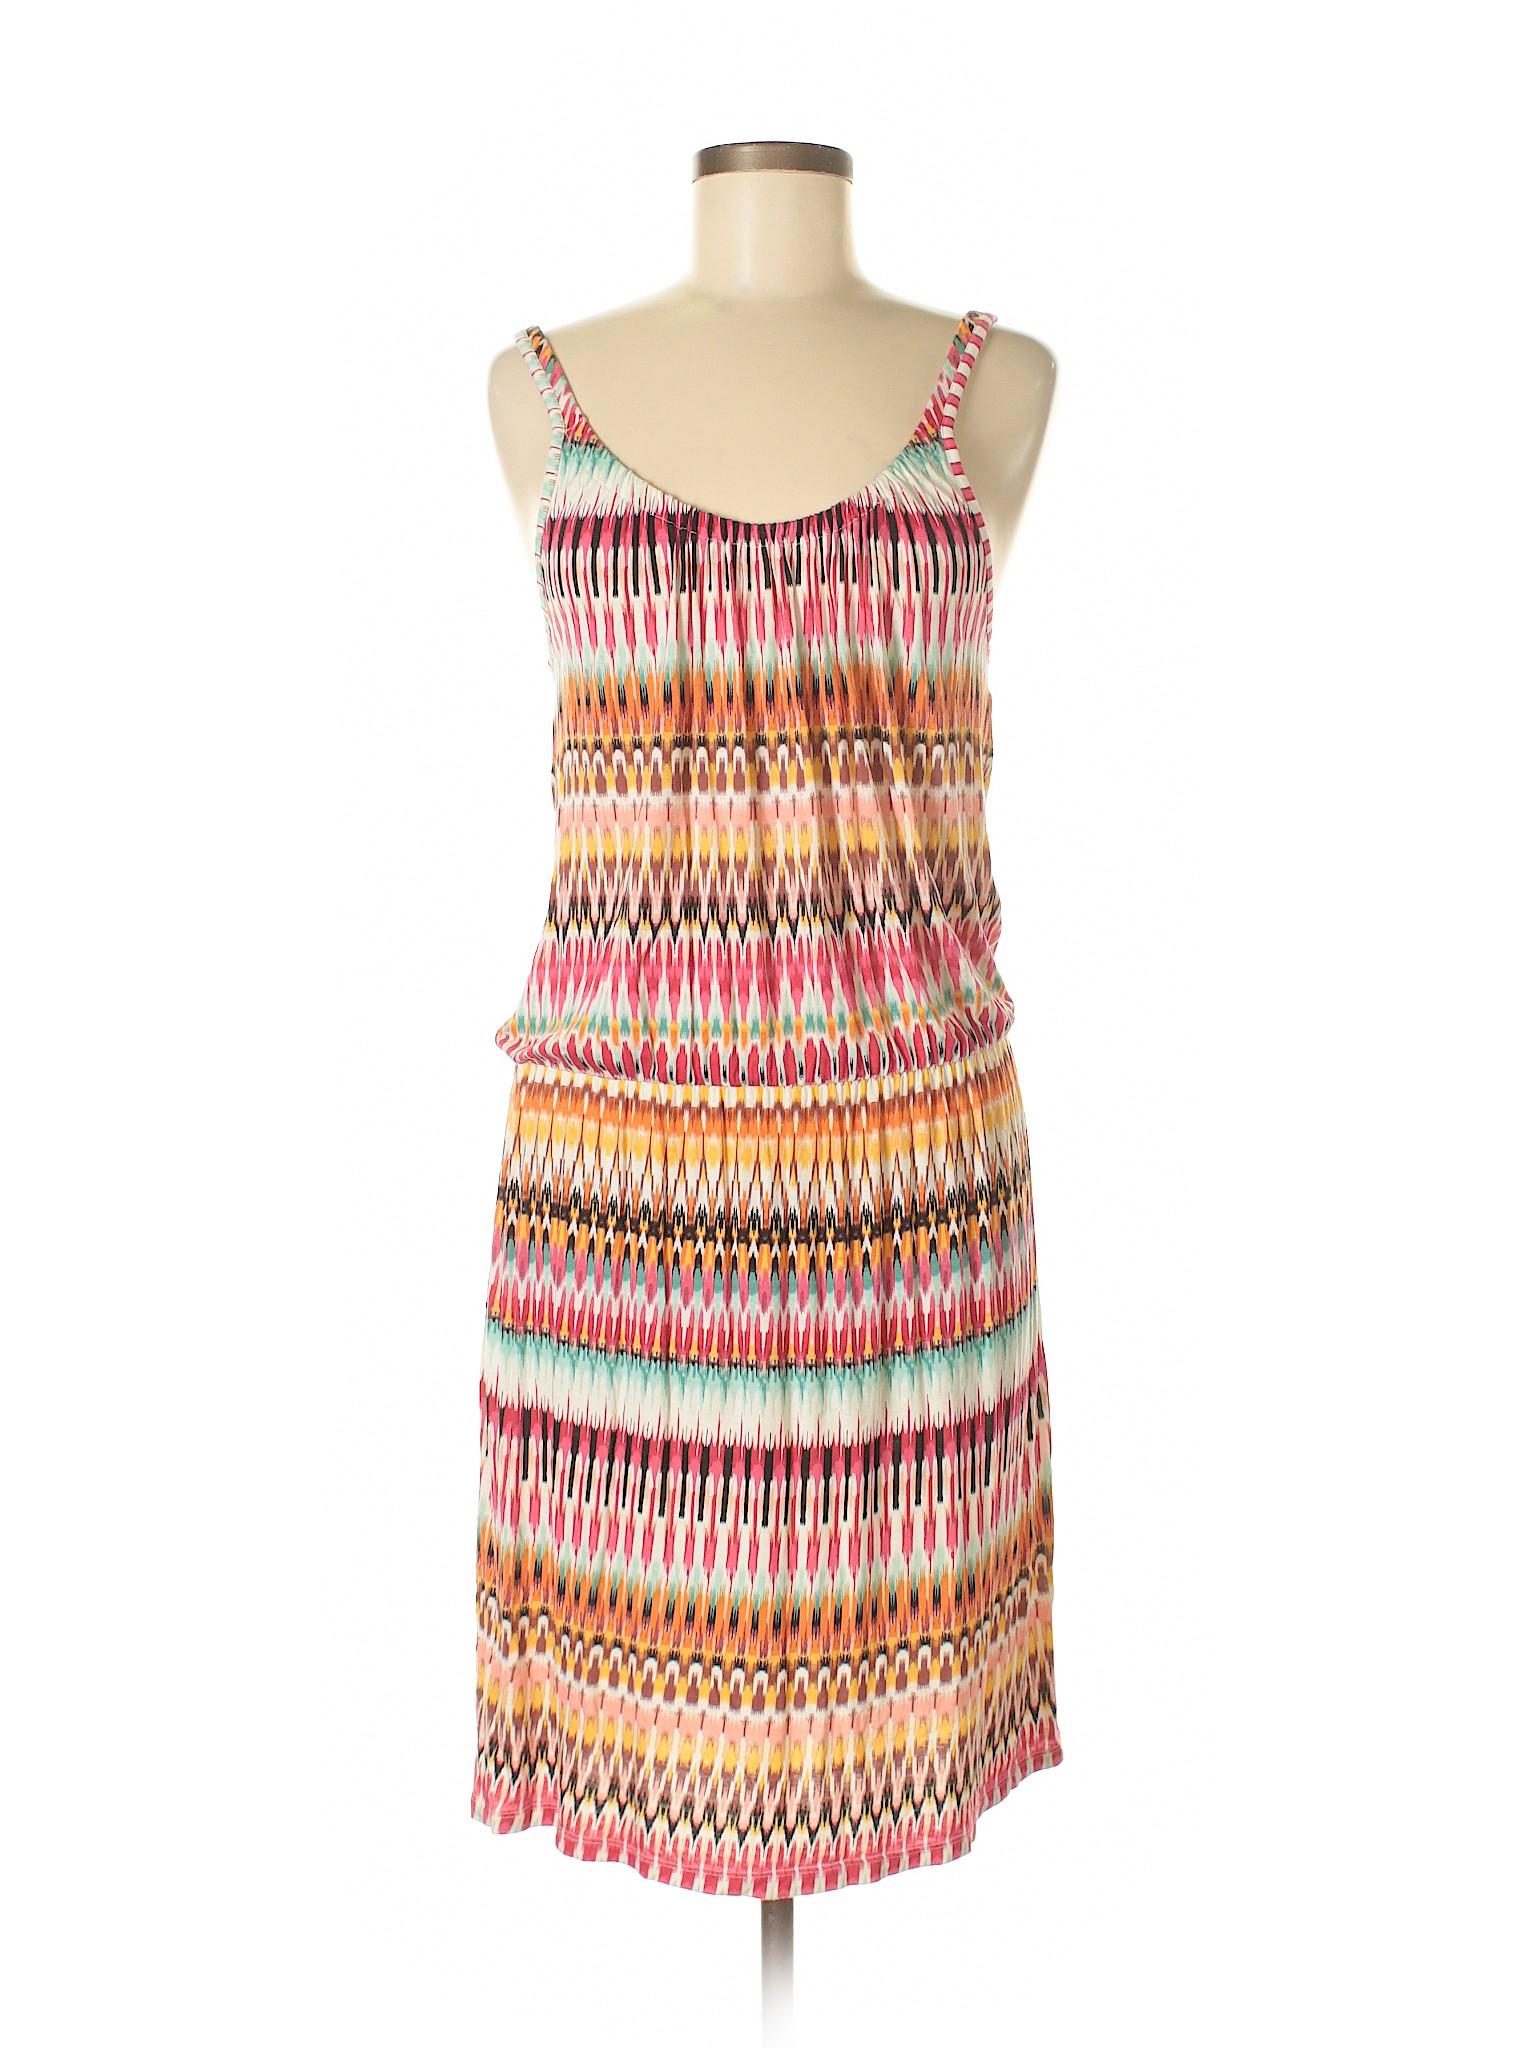 Casual Taylor LOFT Boutique winter Dress Ann nEH4I4q